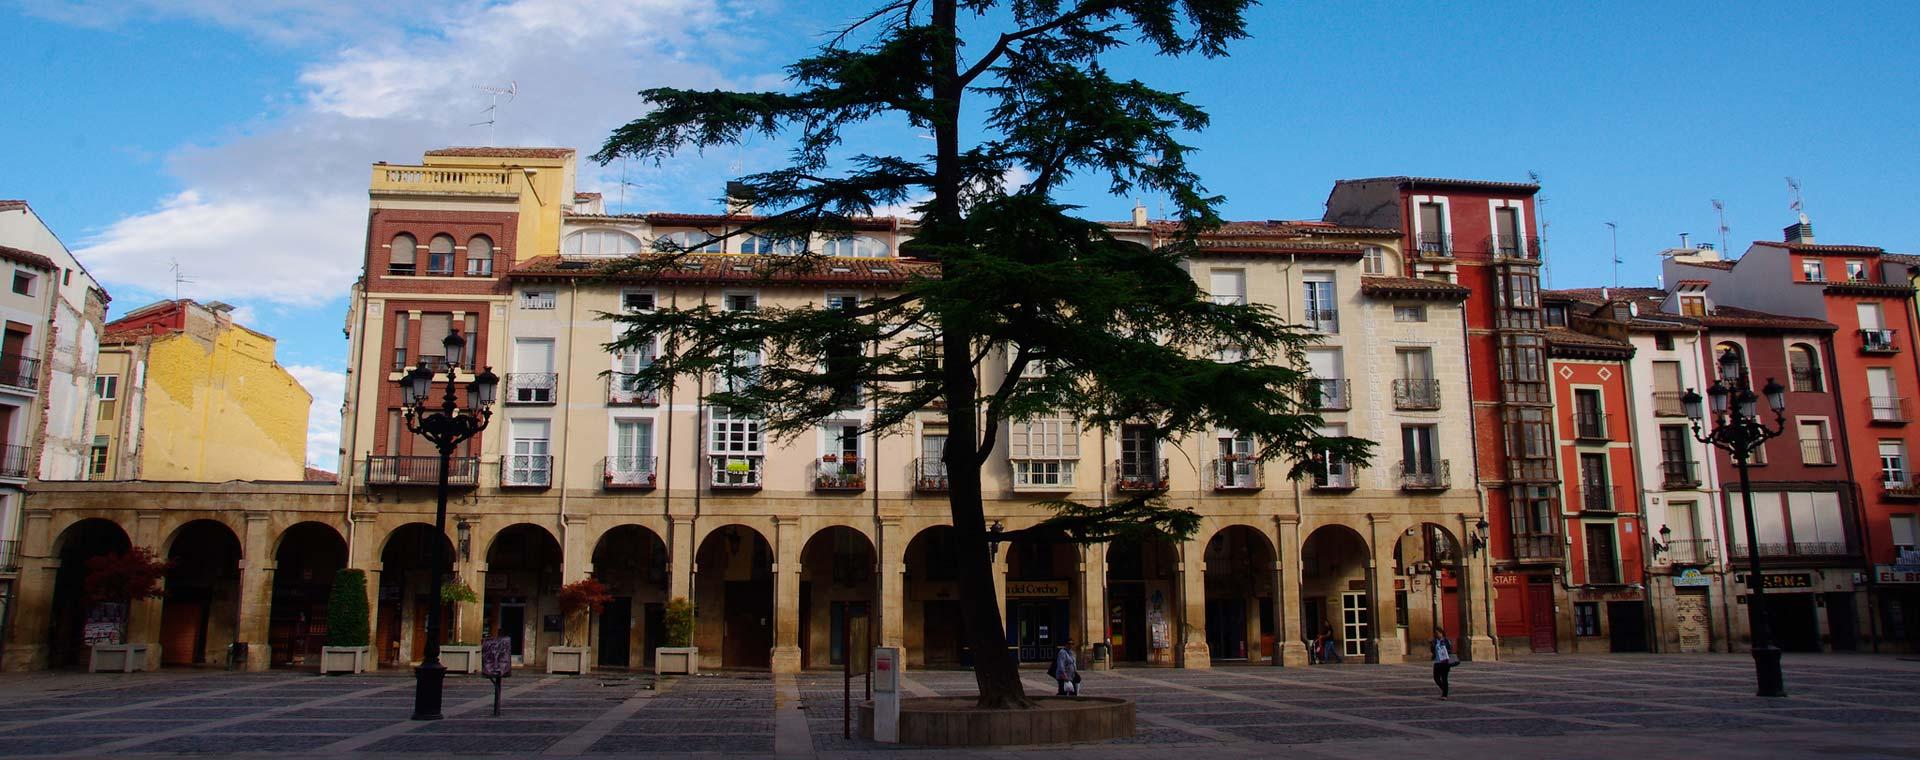 Ginkana en Logroño